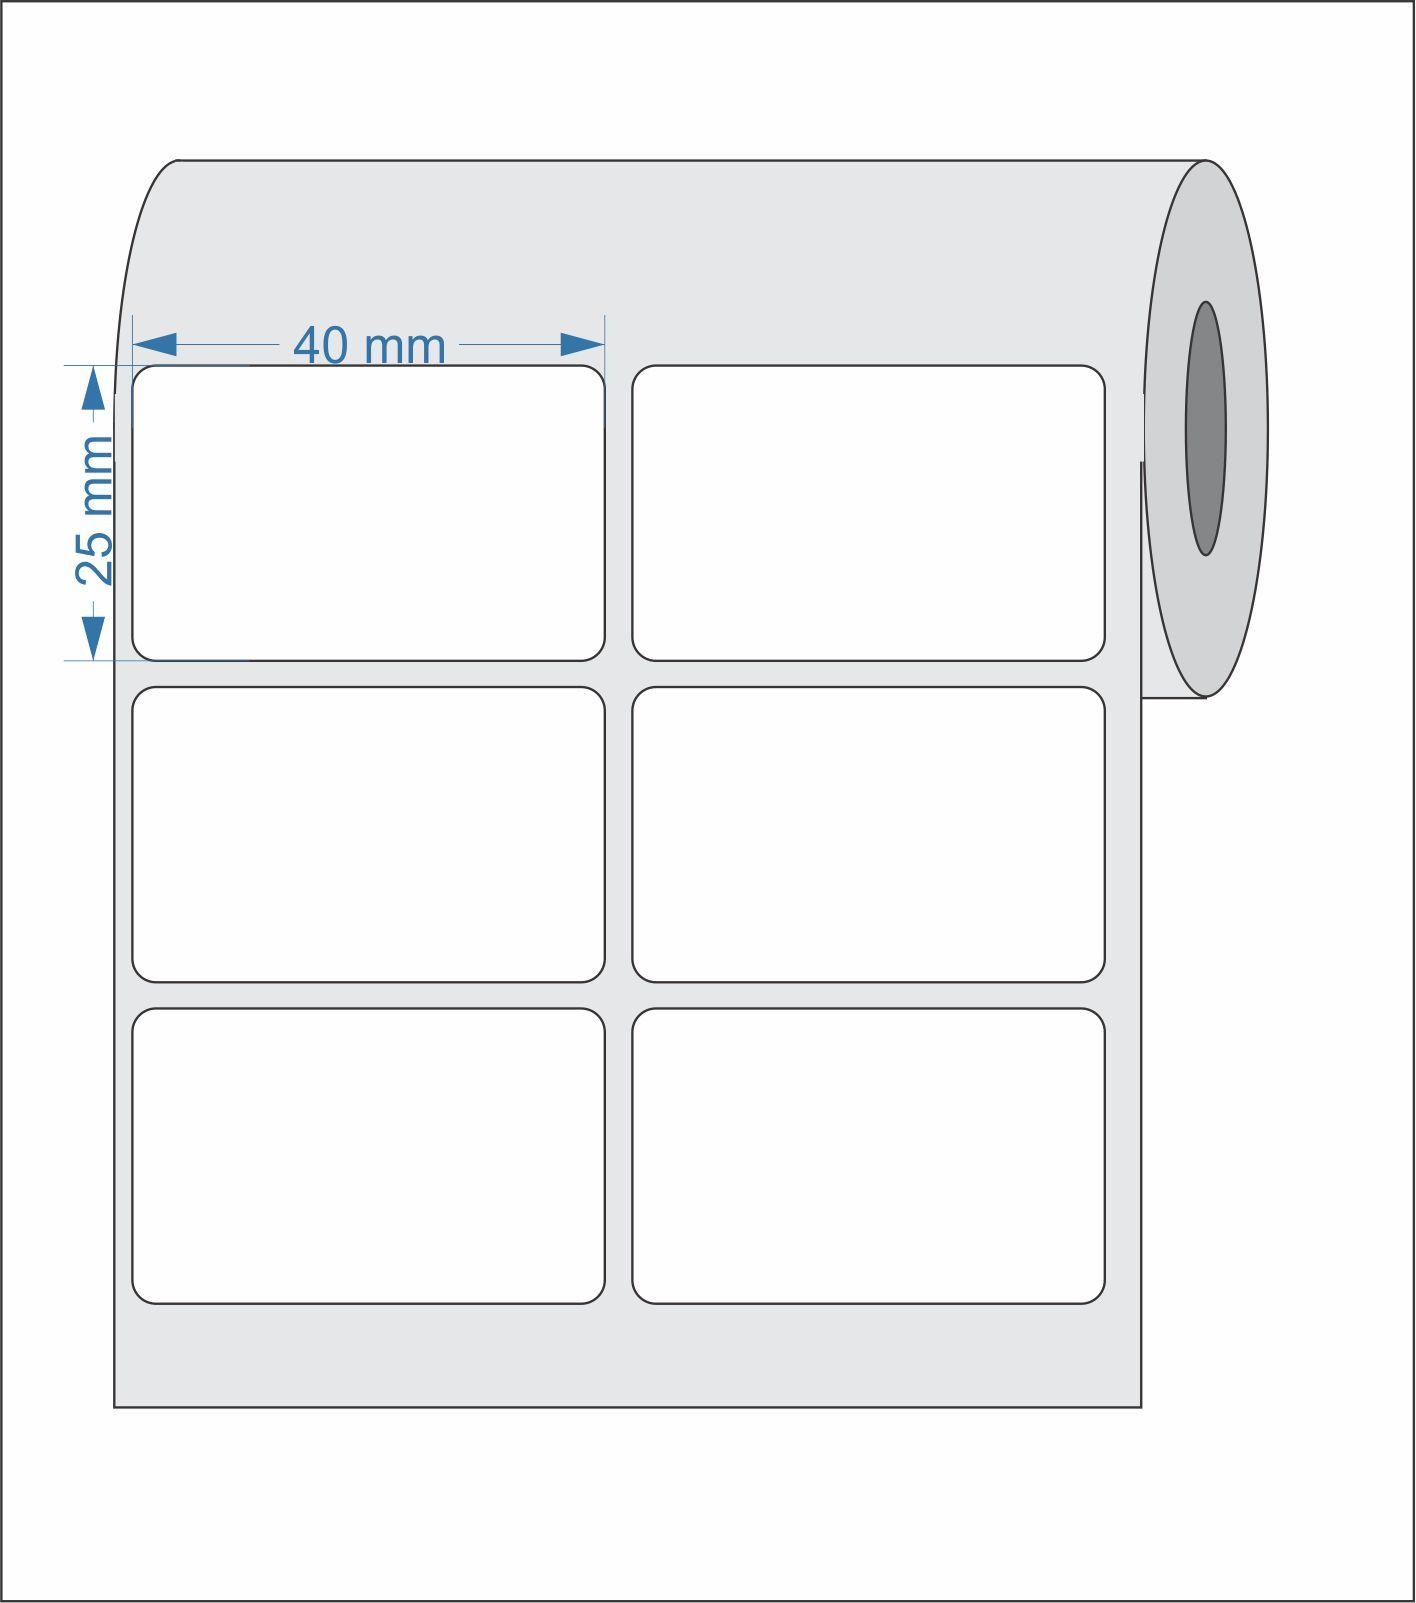 Etiquetas Adesivas 40x25 mm  BOPP 02 Colunas - 5 ROLOS